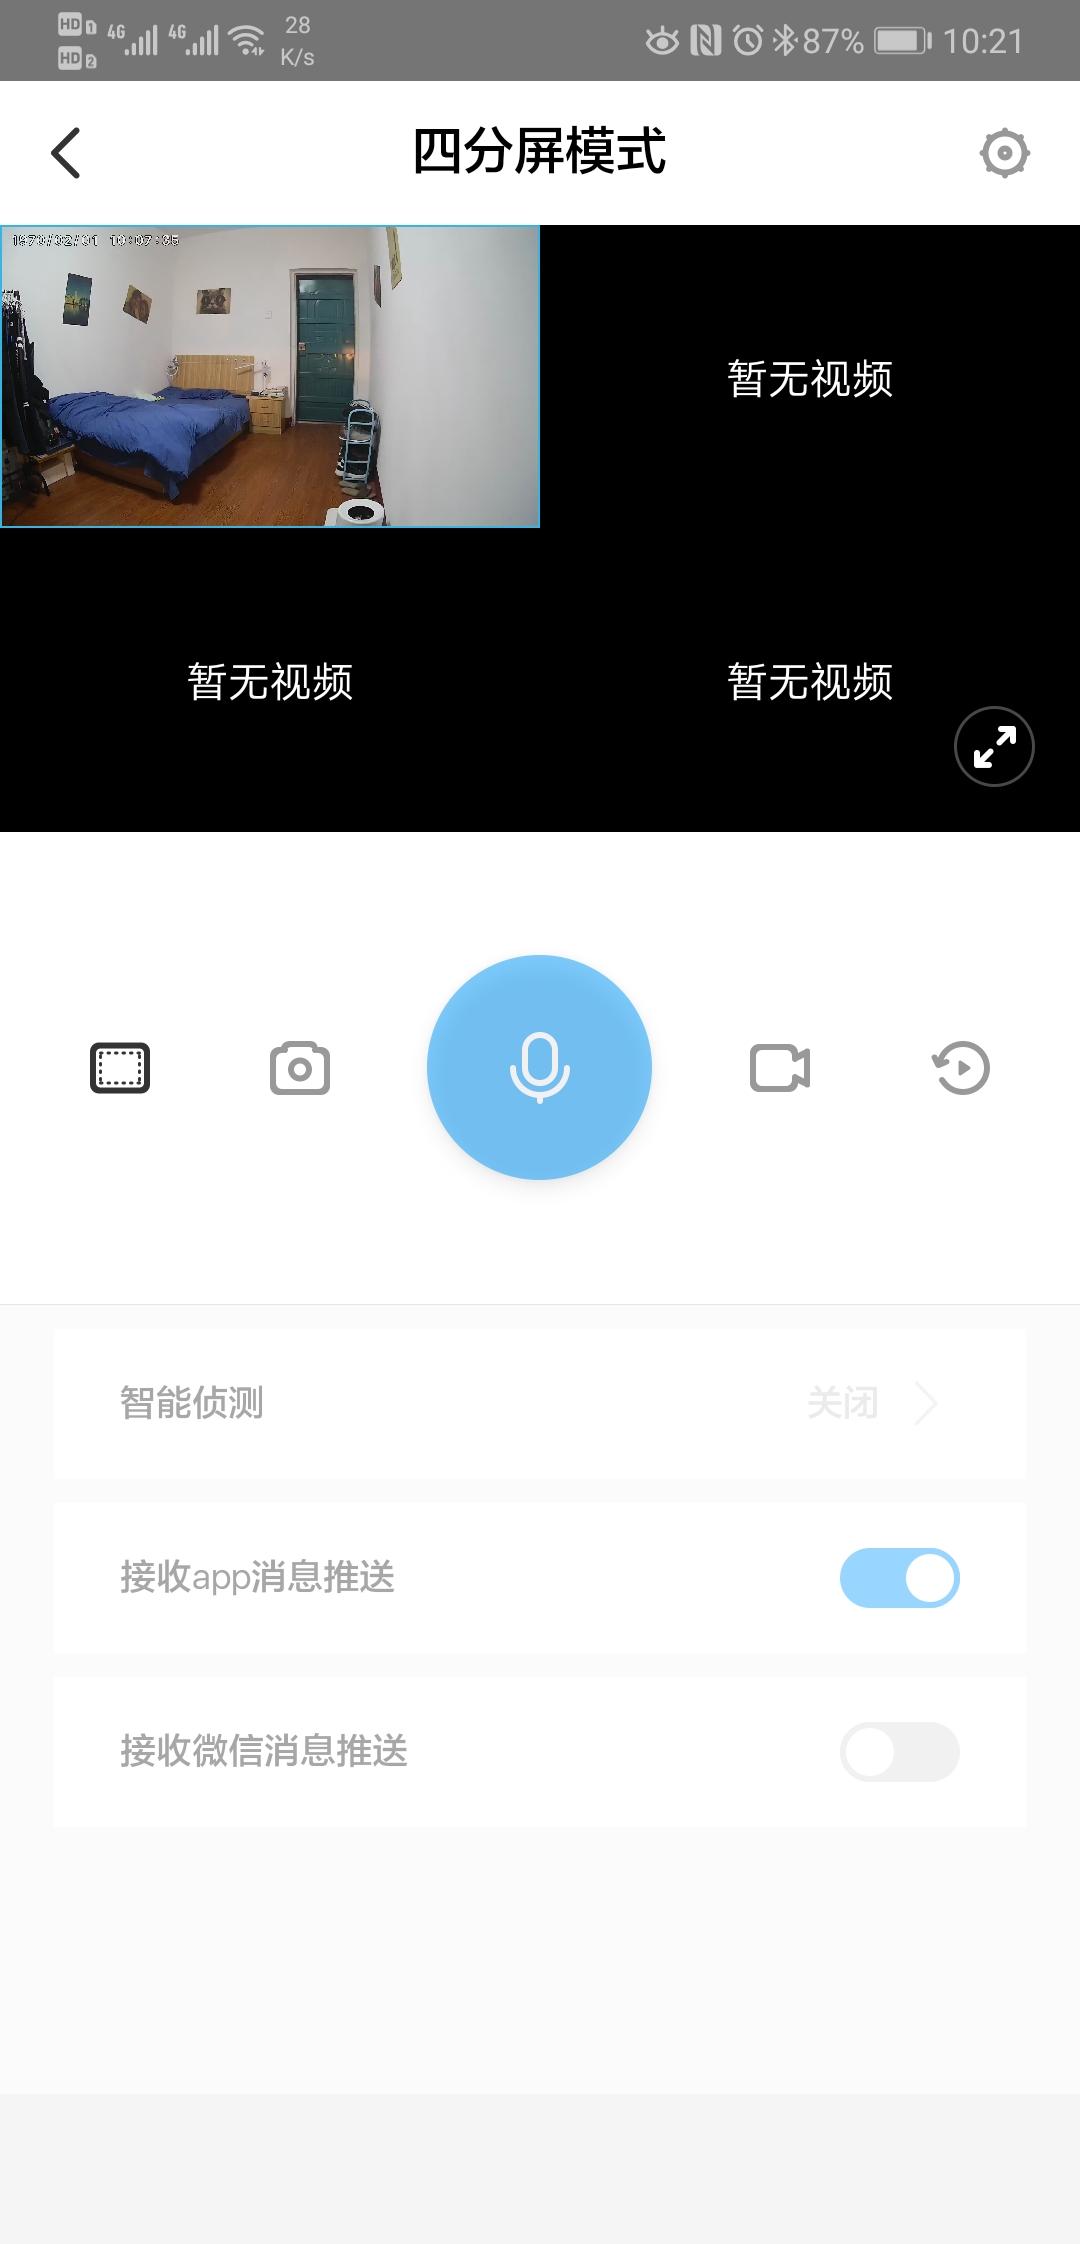 Screenshot_20190223_222110_com.huawei.ipc_honor.jpg